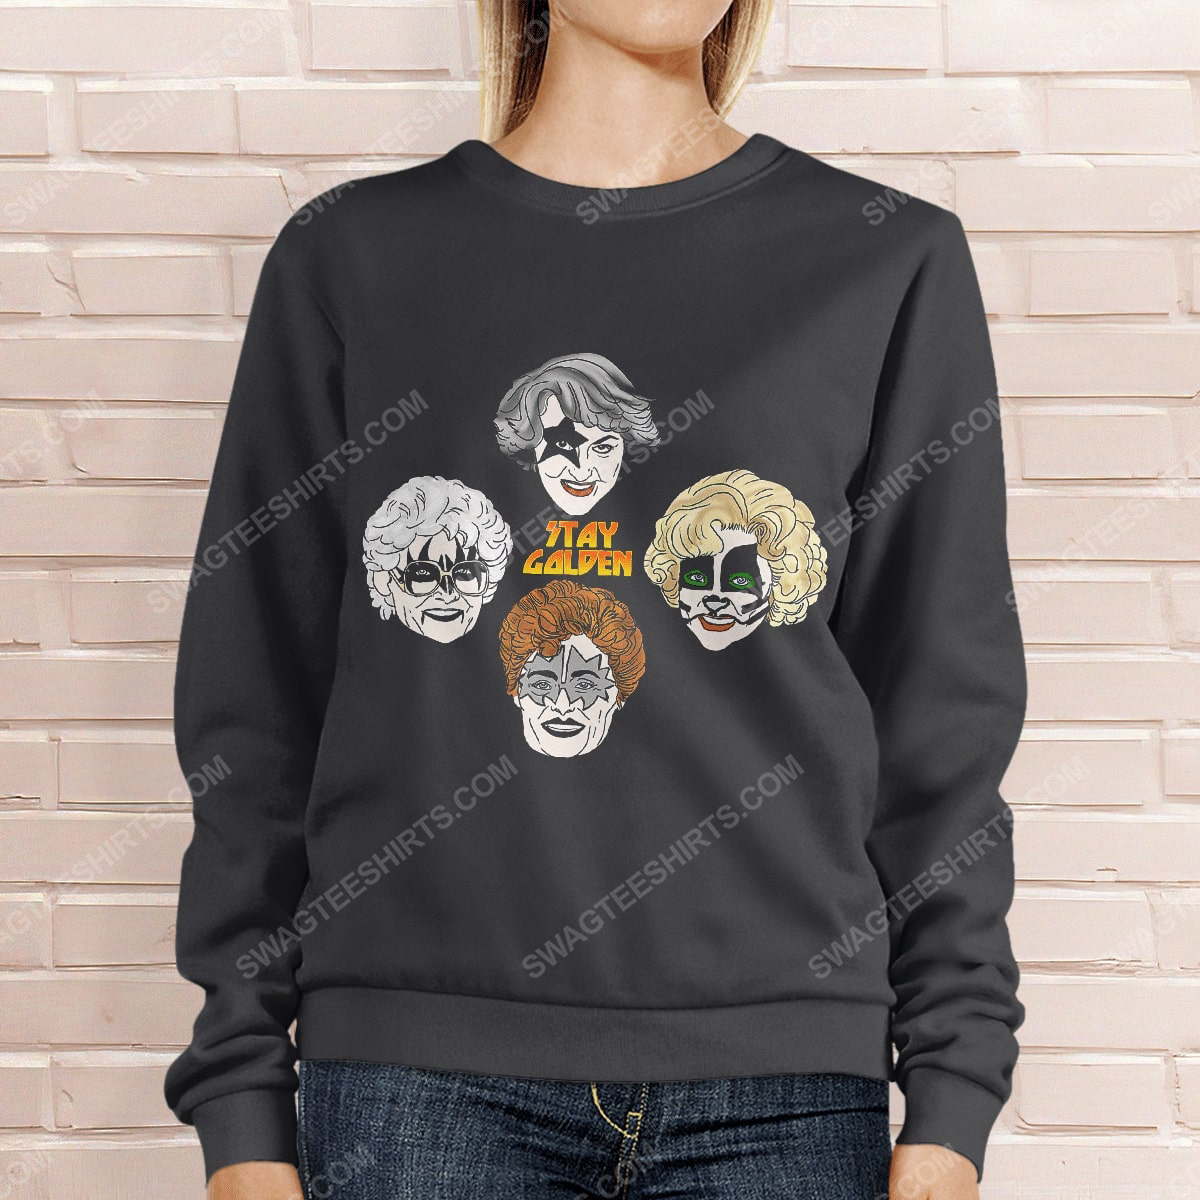 Kiss and the golden girls stay golden sweatshirt 1(1)